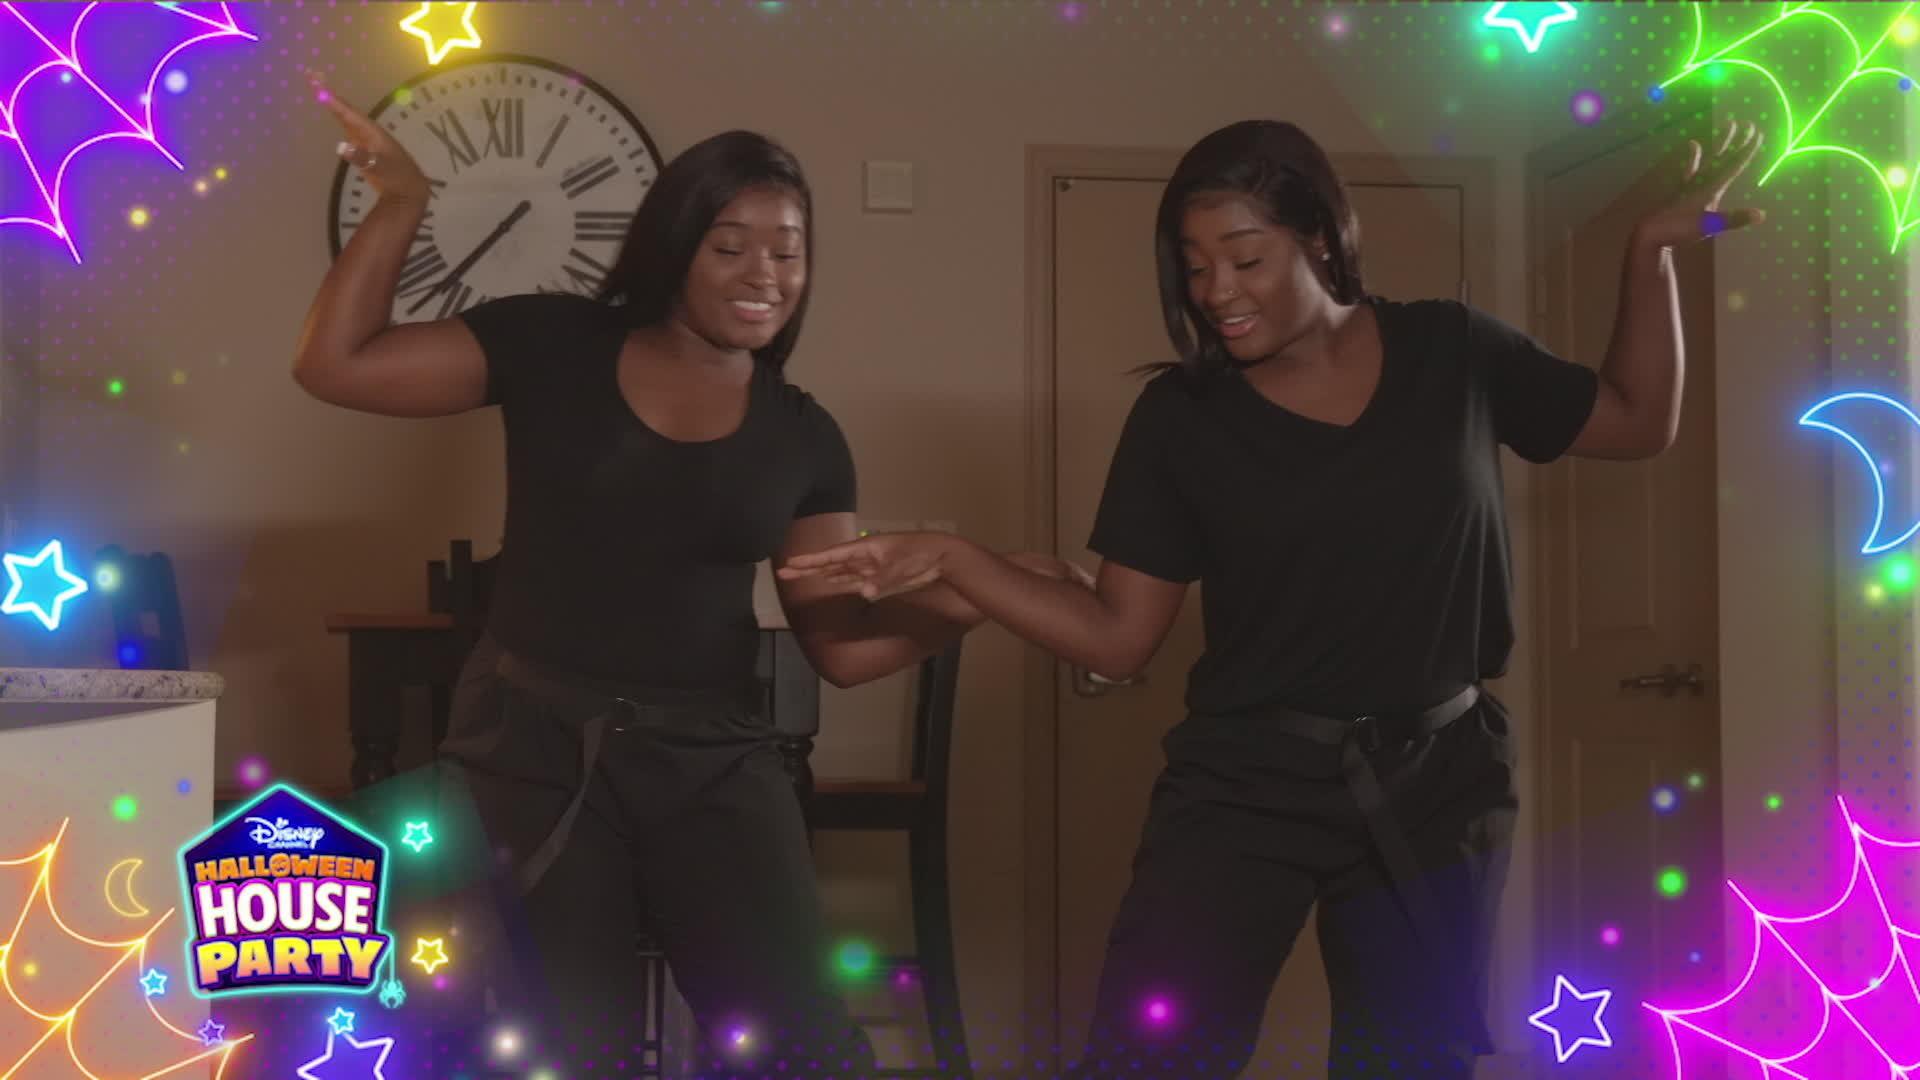 Halloween House Party Dance Tutorial